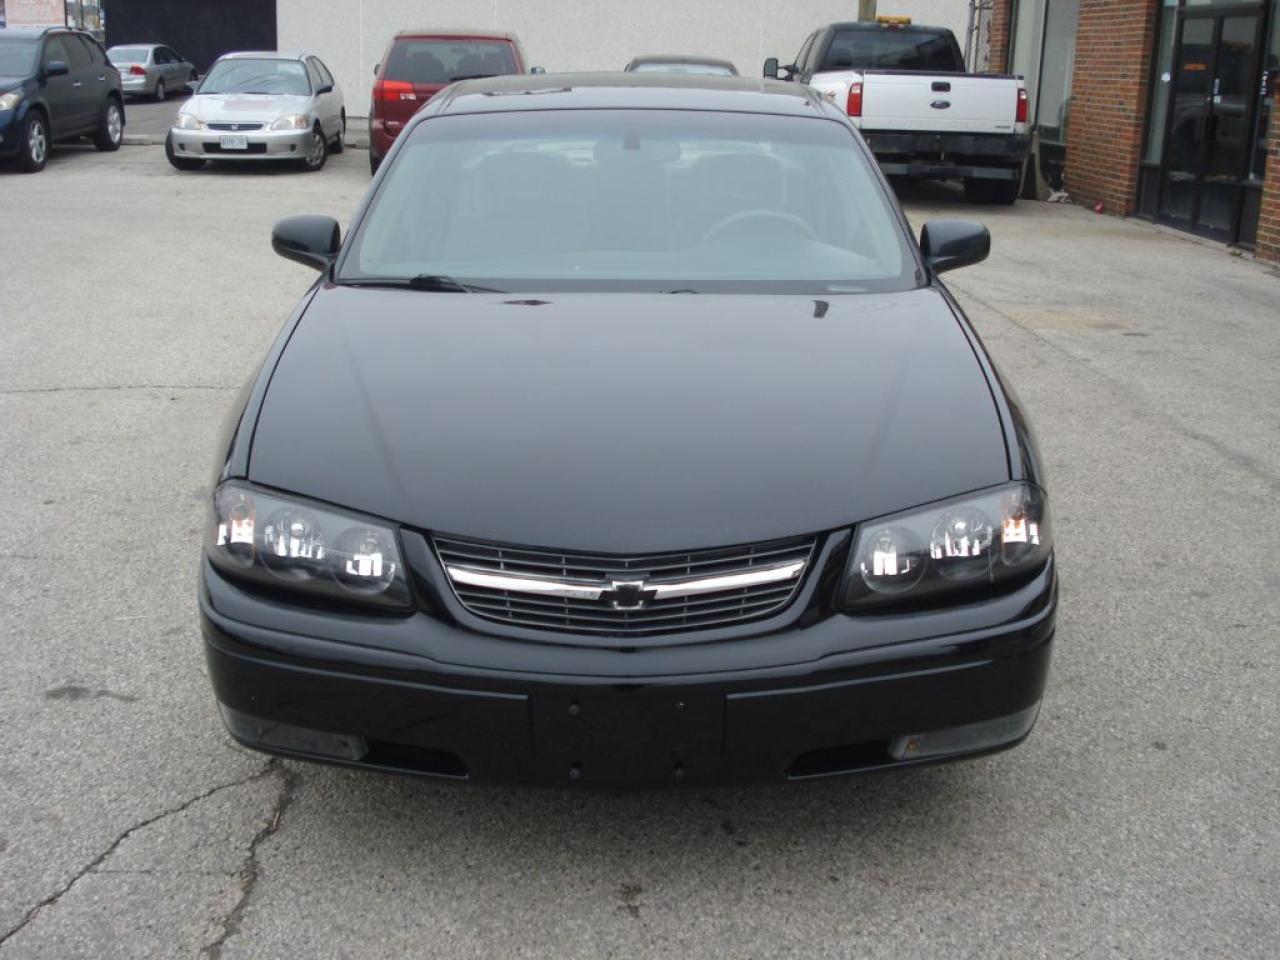 Photo of Black 2003 Chevrolet Impala